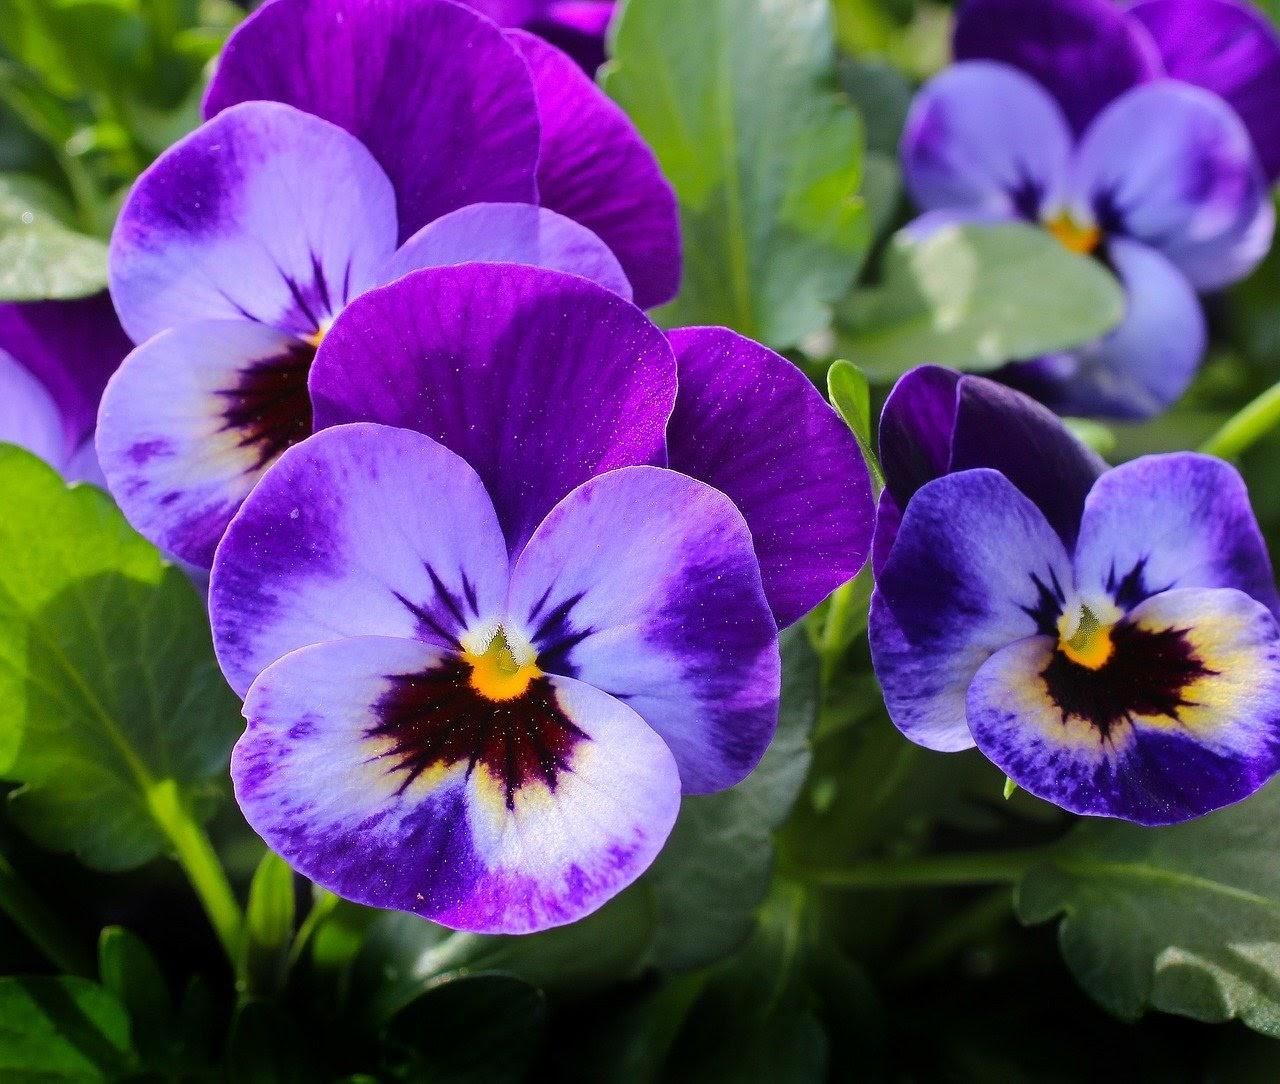 a bright purple pansy